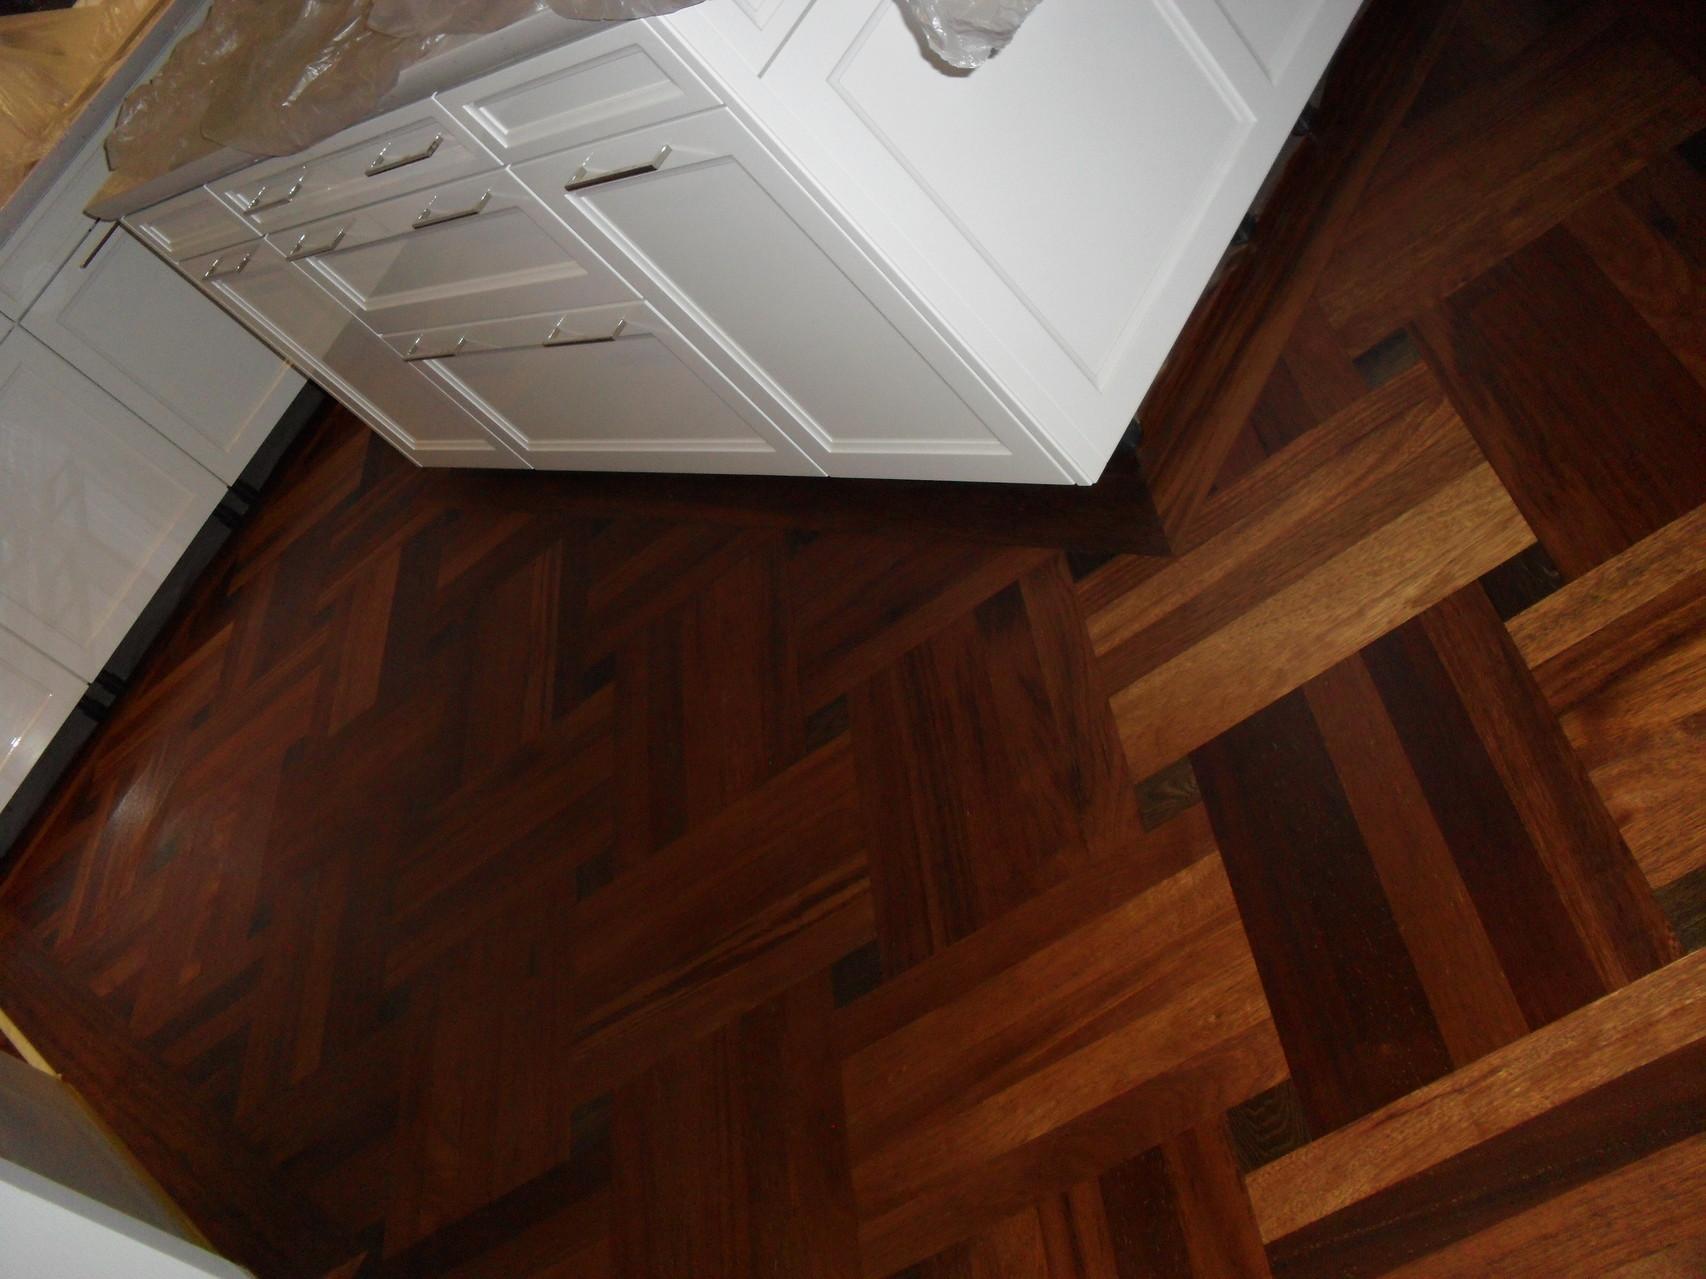 profi bodenleger profi top qualit t. Black Bedroom Furniture Sets. Home Design Ideas